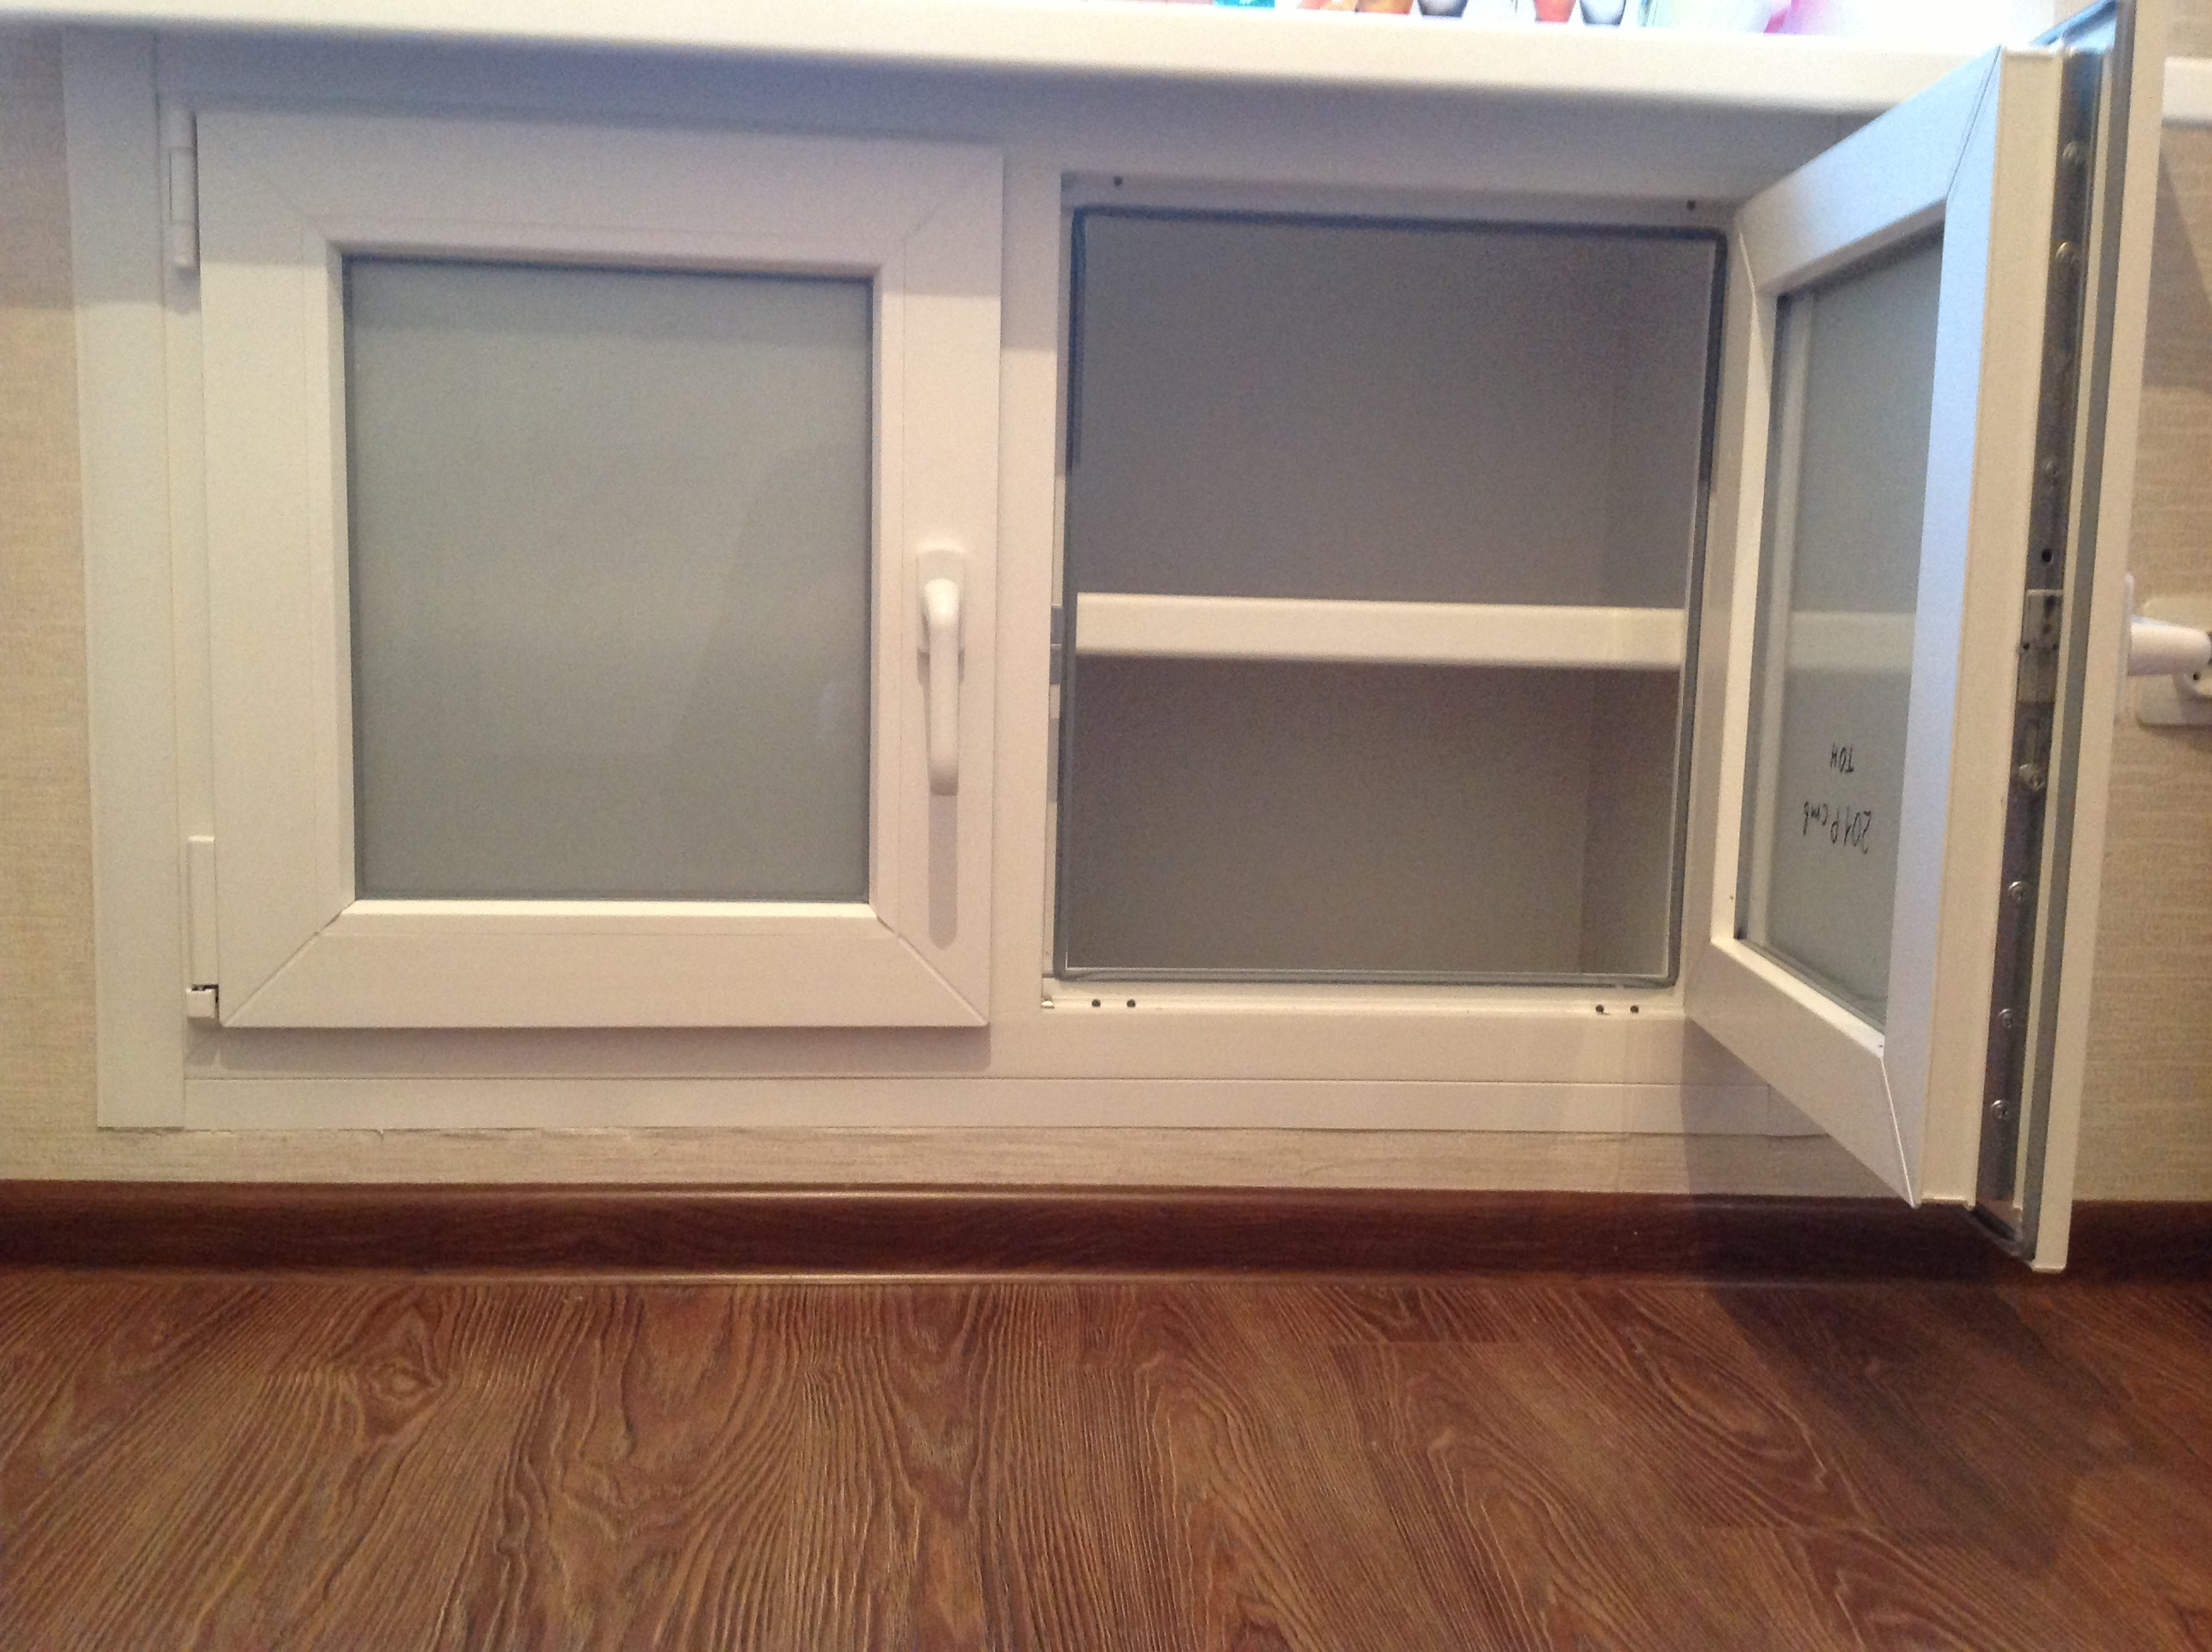 Переделка холодильника под окном